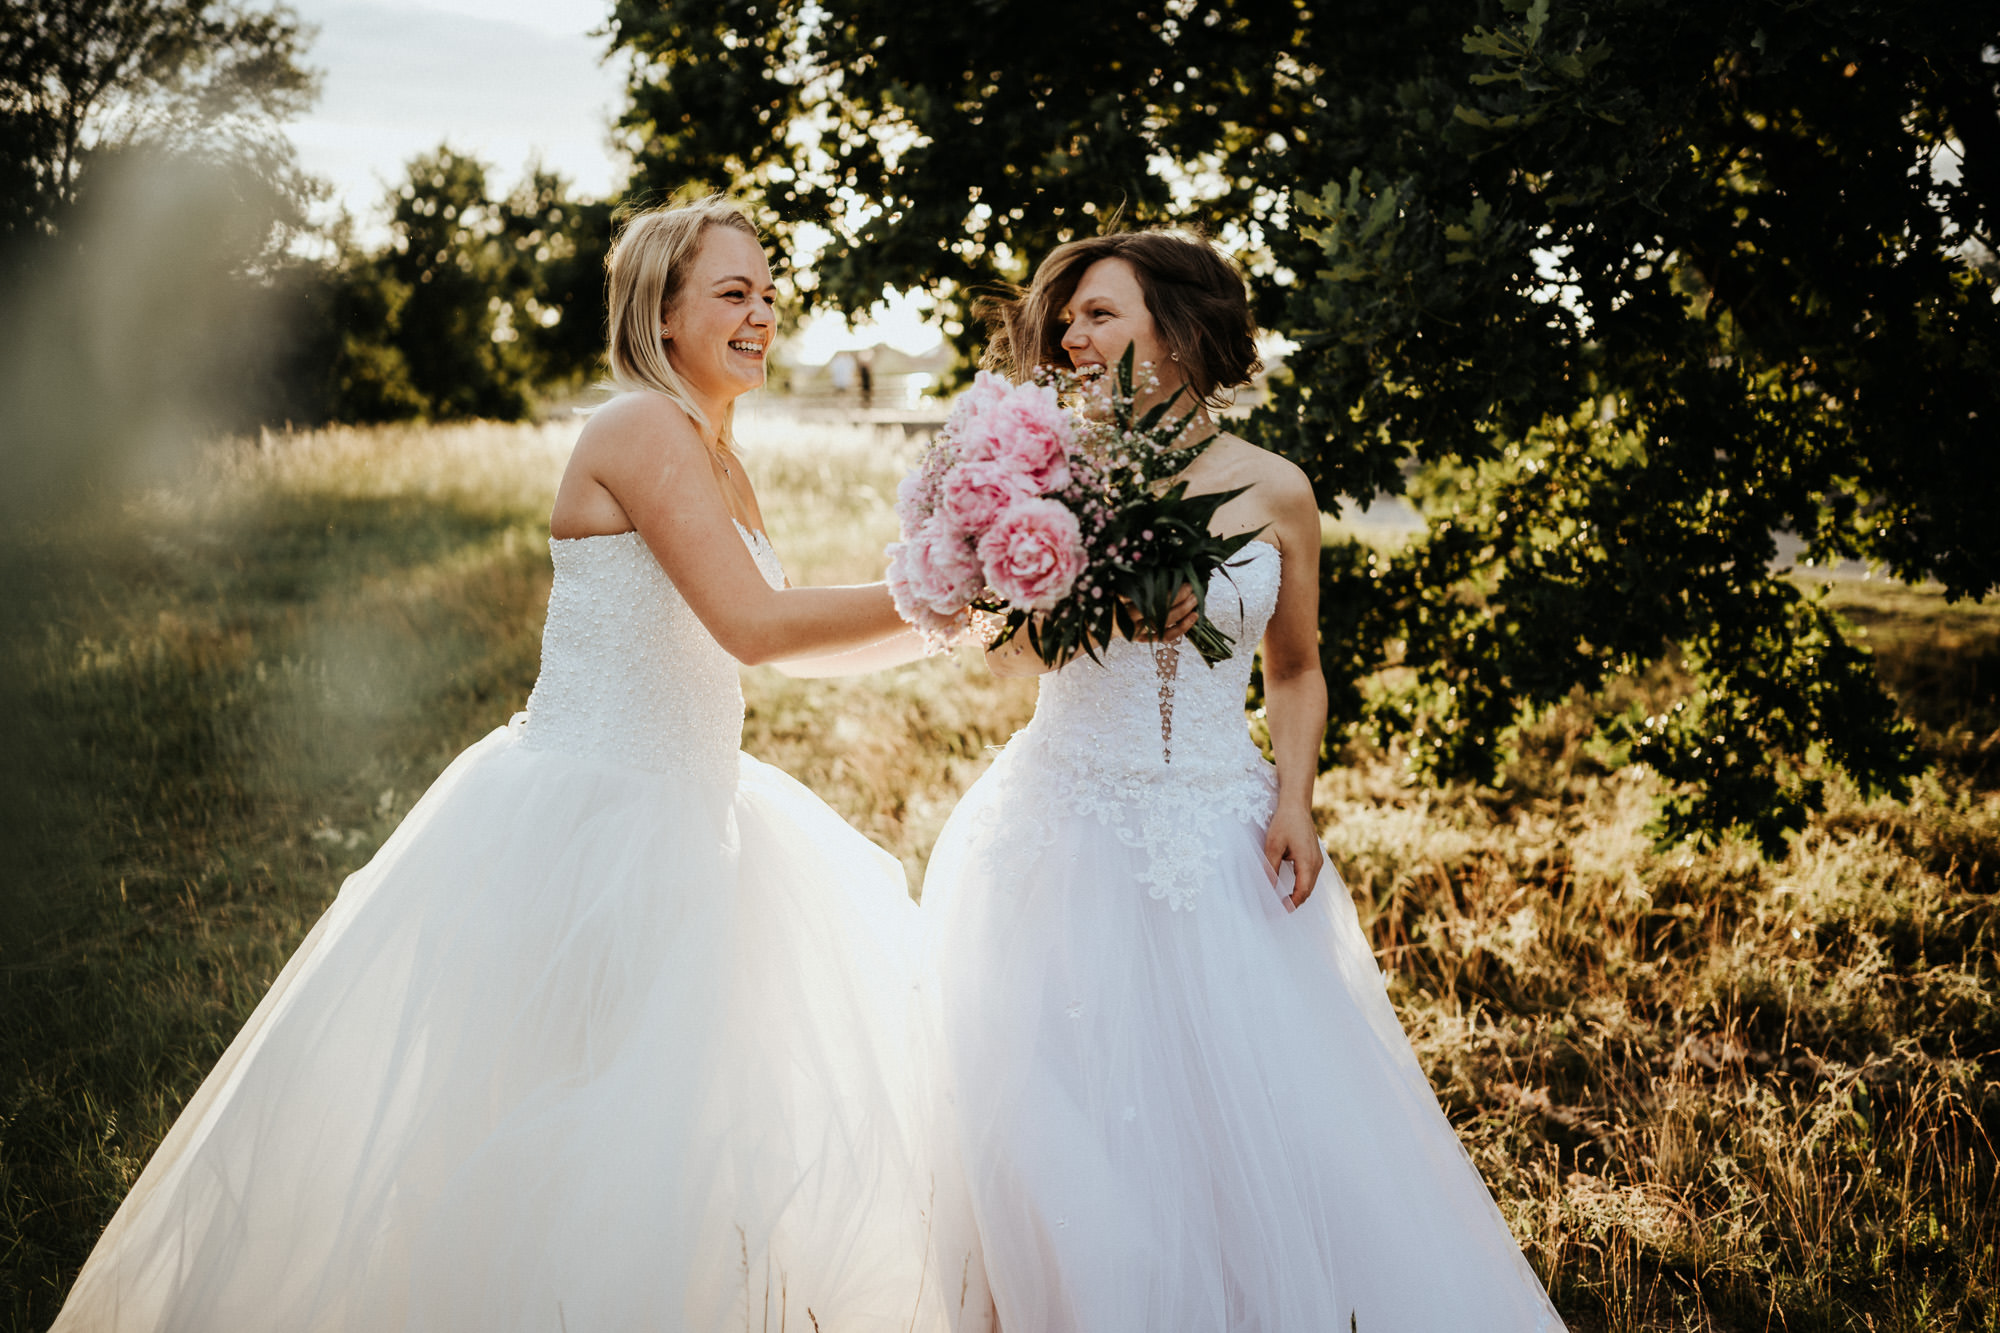 waltsmedia-hochzeitsreportage-after-wedding-shooting-berlin-7